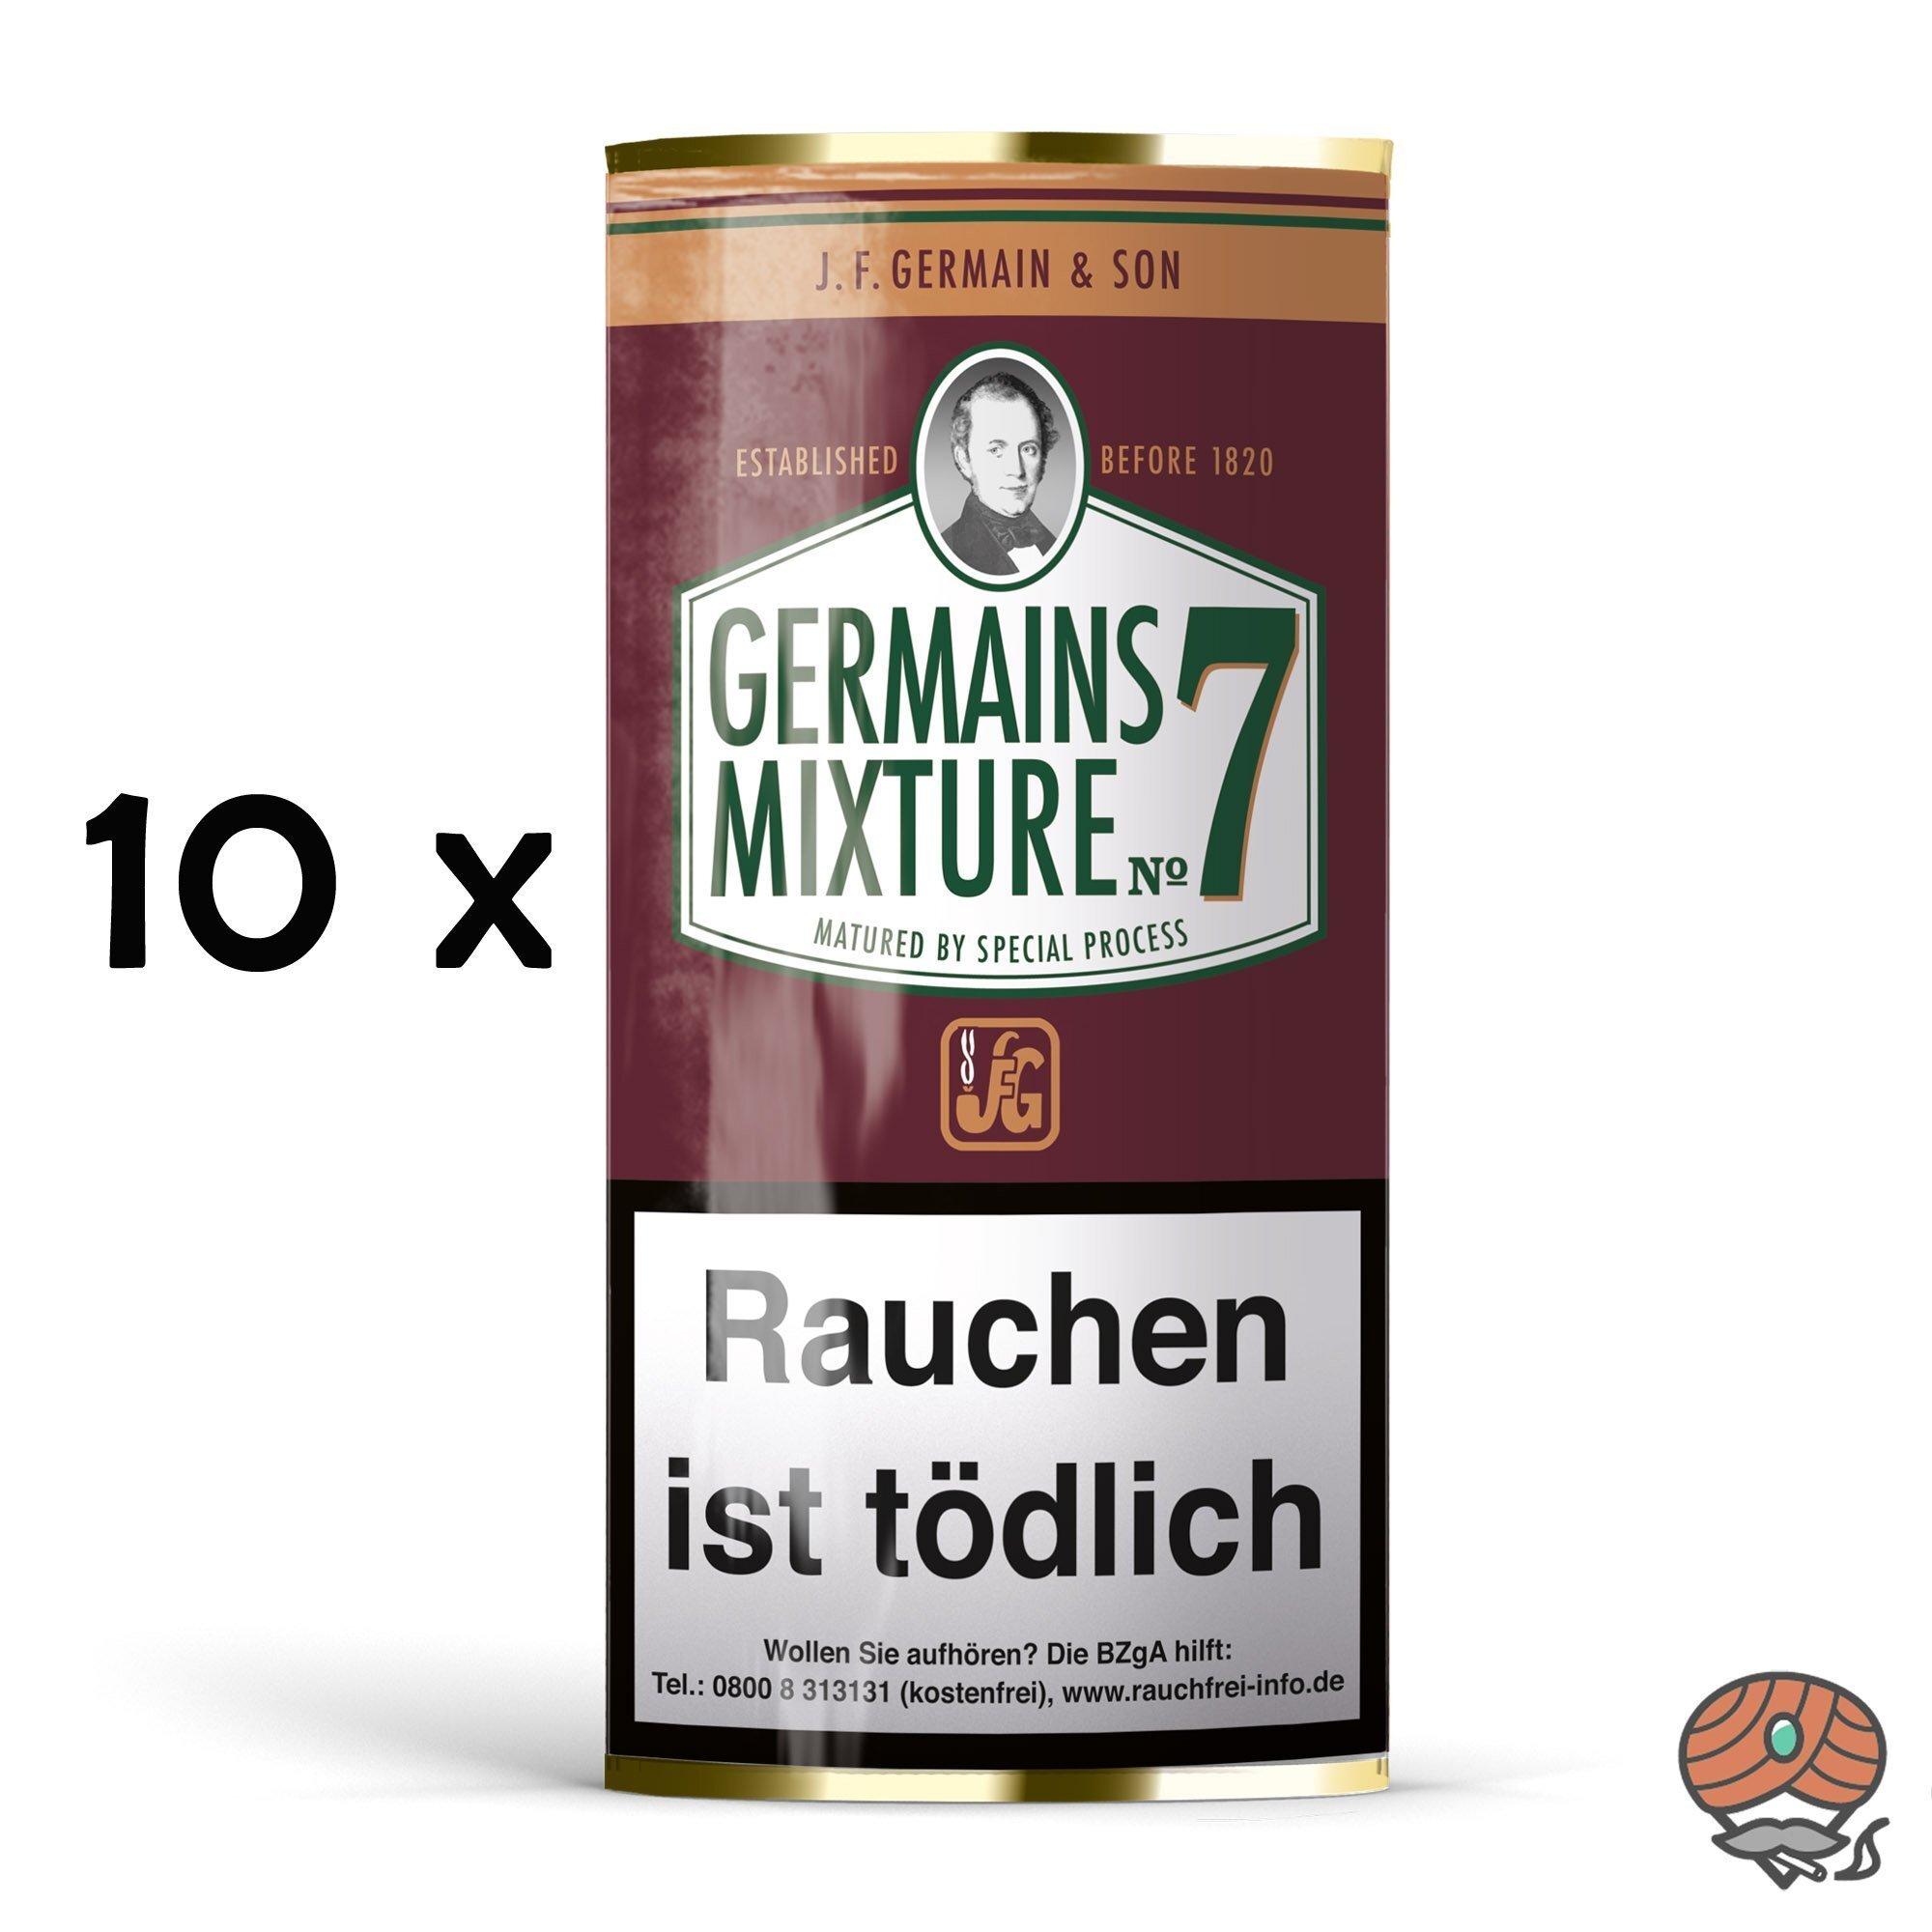 10 x Germain´s Mixture No.7 Pfeifentabak 50 g Pouches